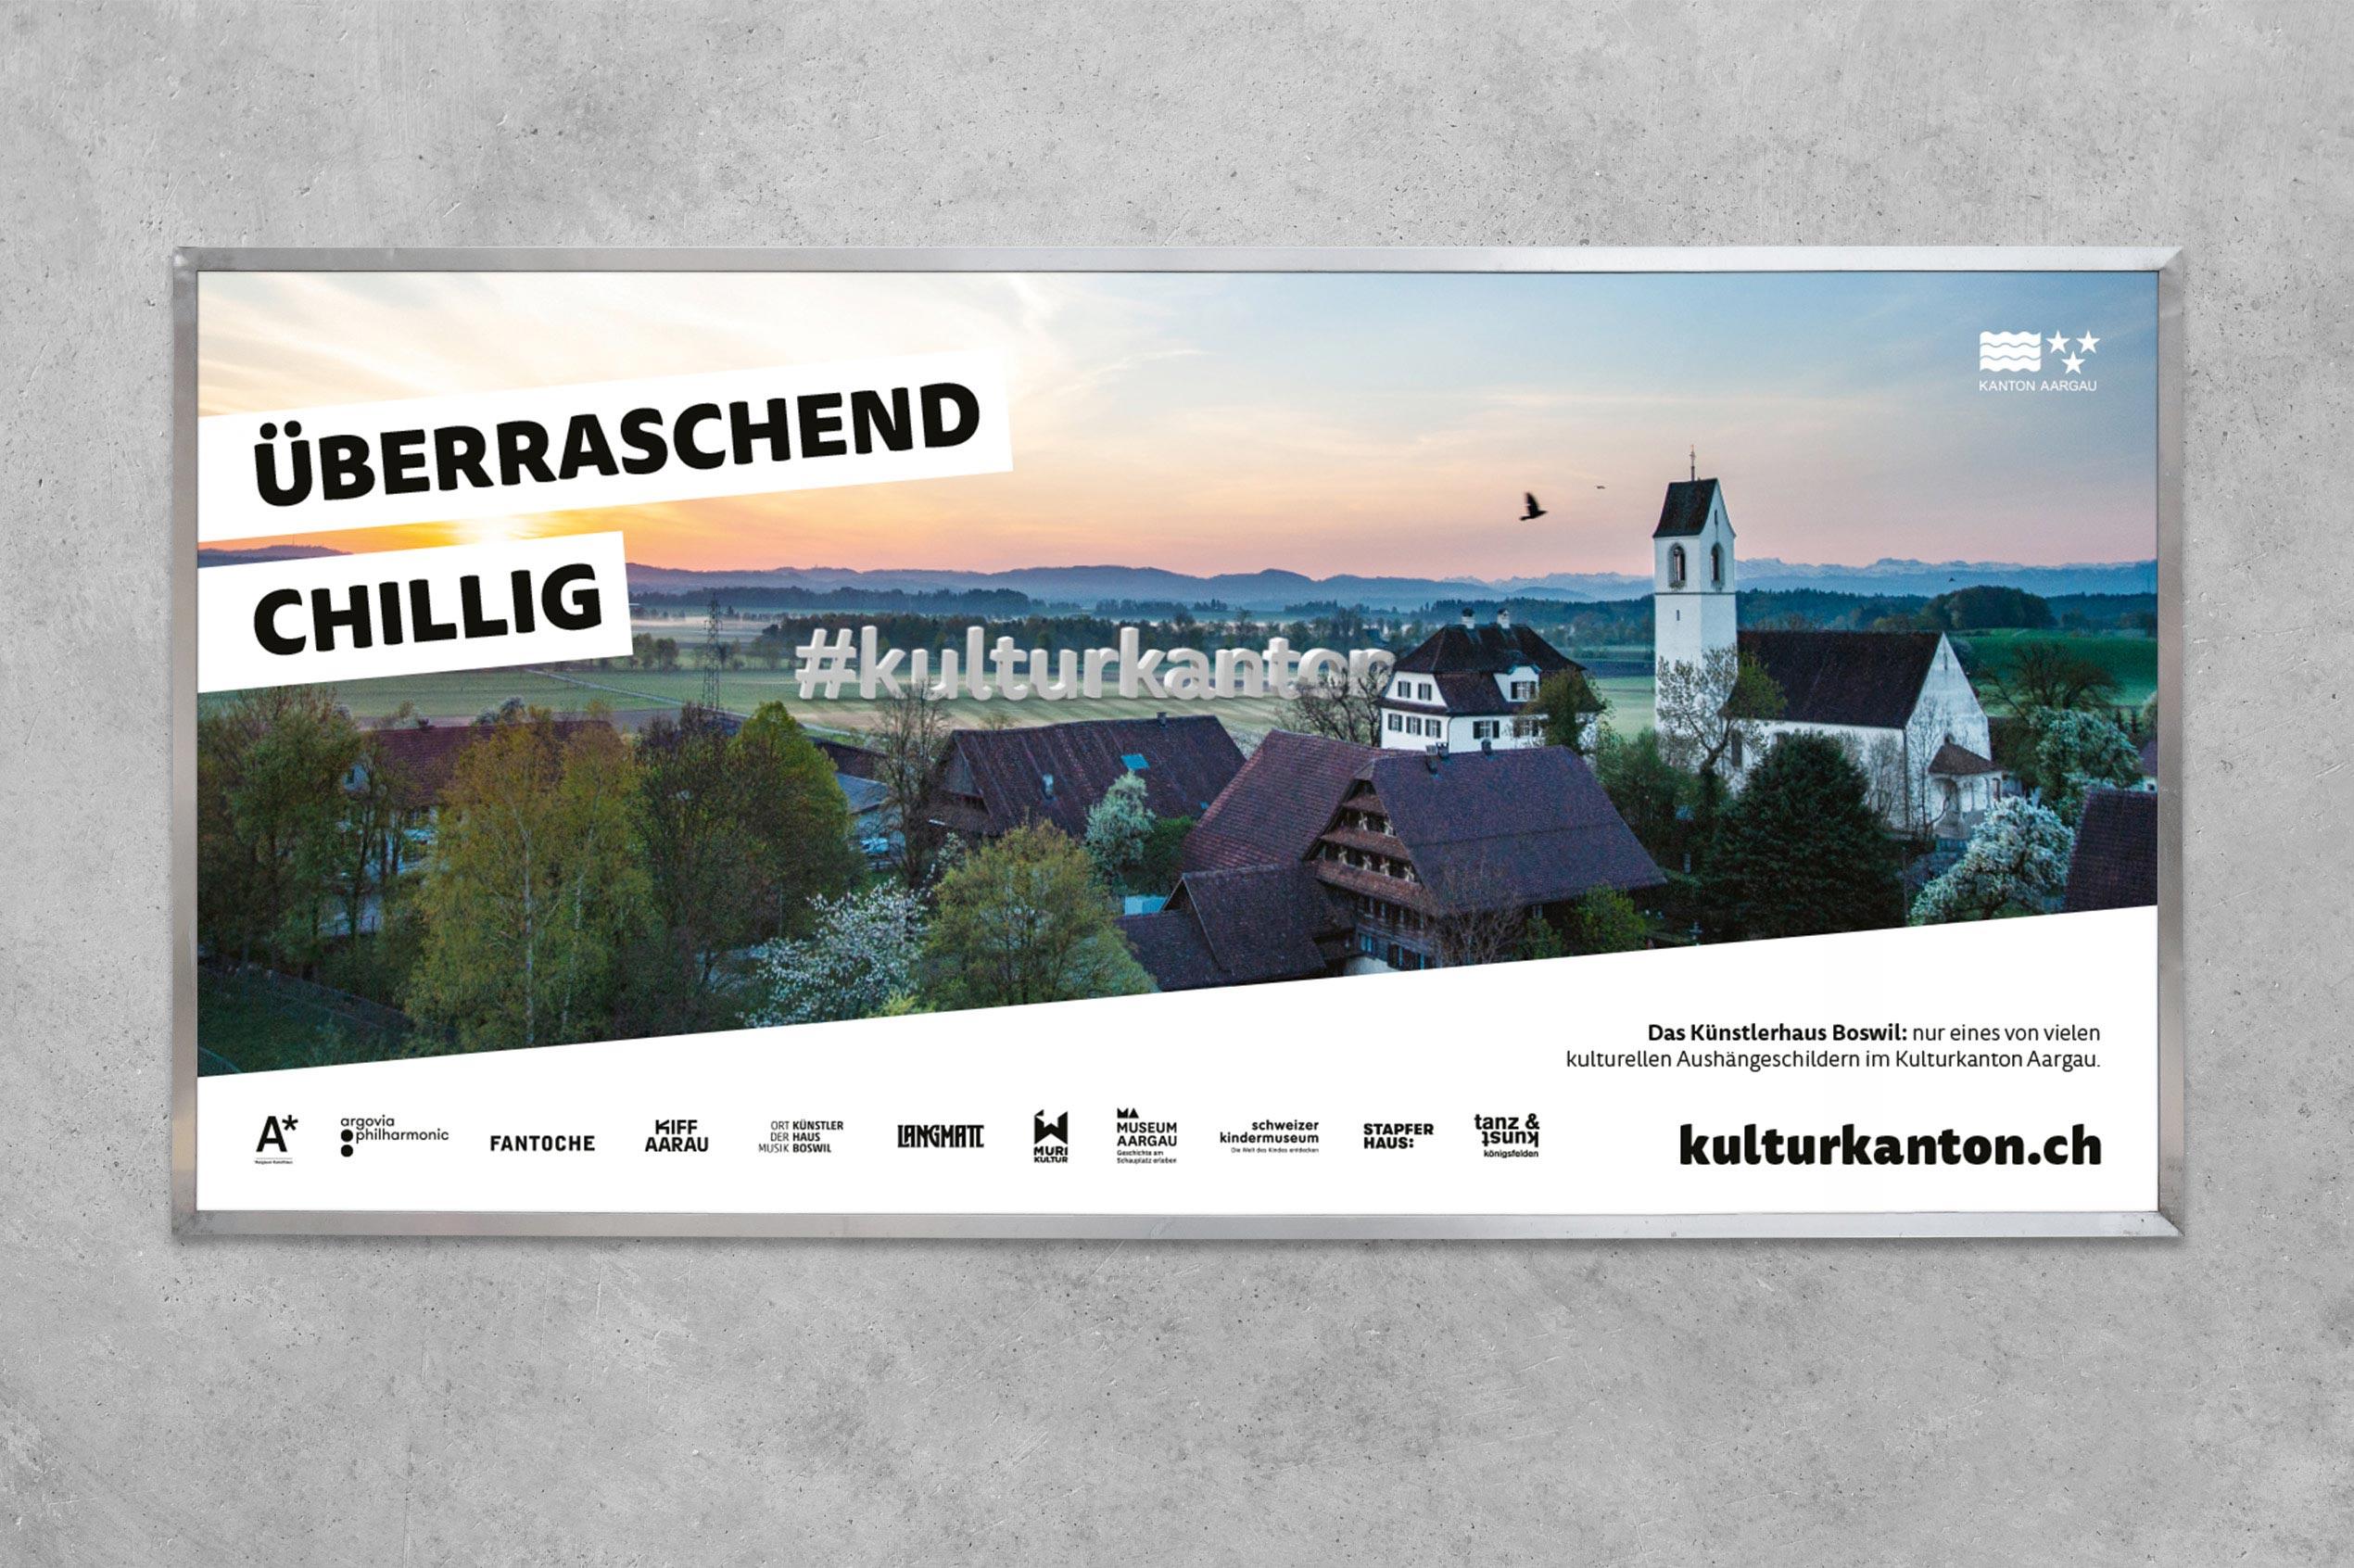 Kulturkanton, Plakat F12, Künstlerhaus